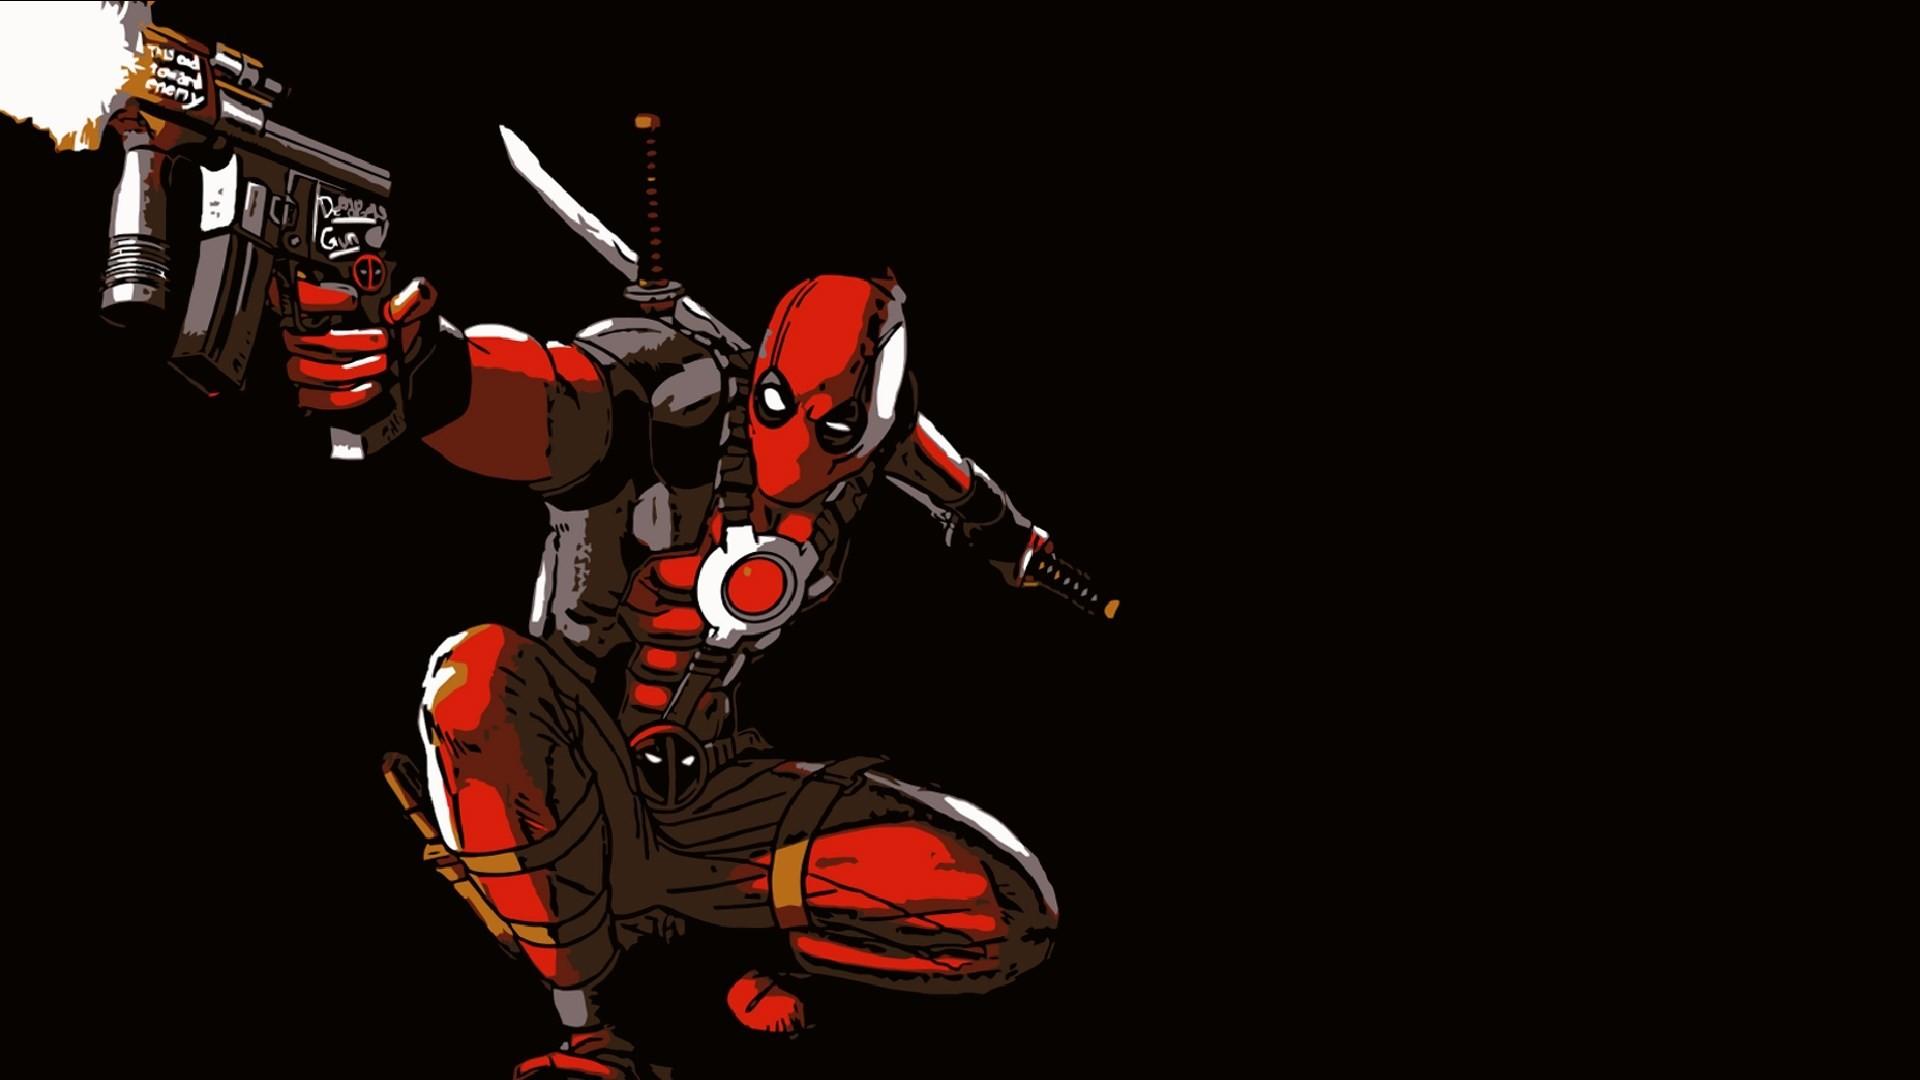 Deadpool HD Desktop Wallpaper (75+ Images